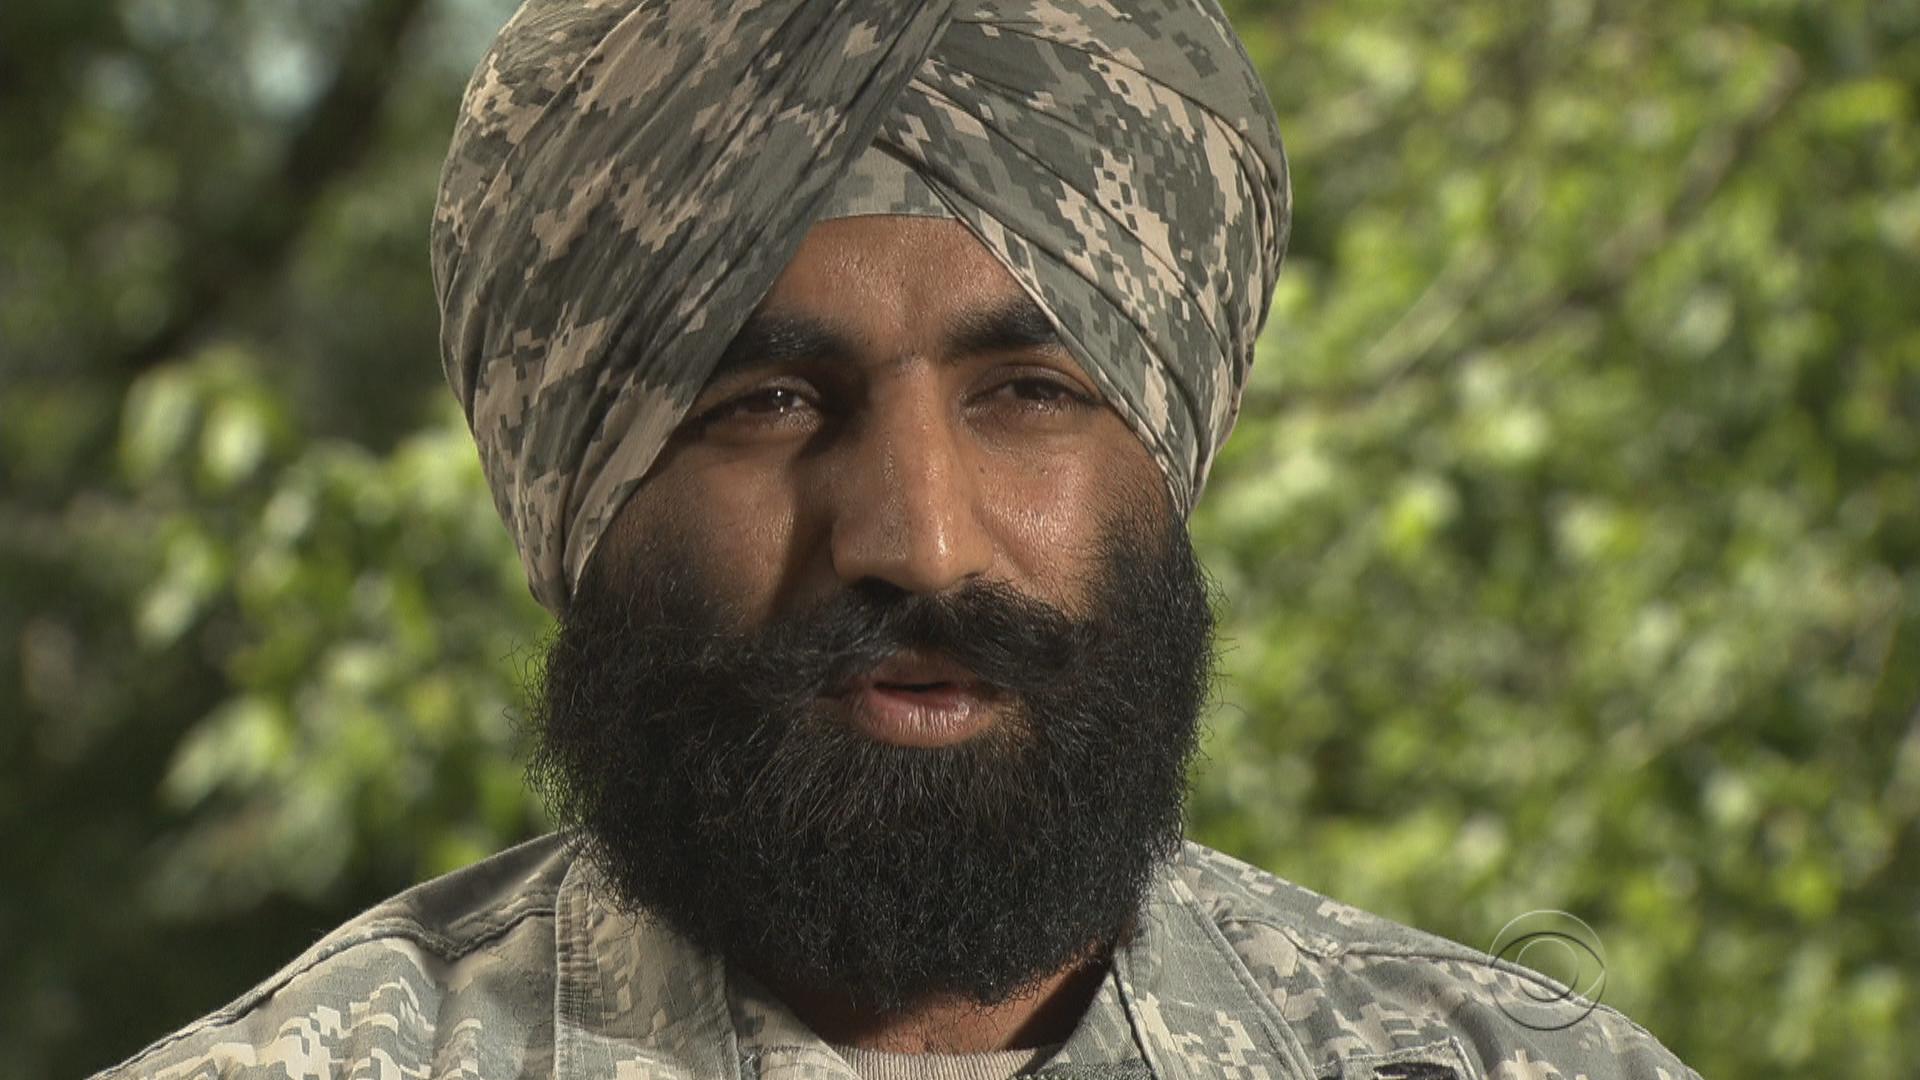 U Beard Sikh U.S. Army ...